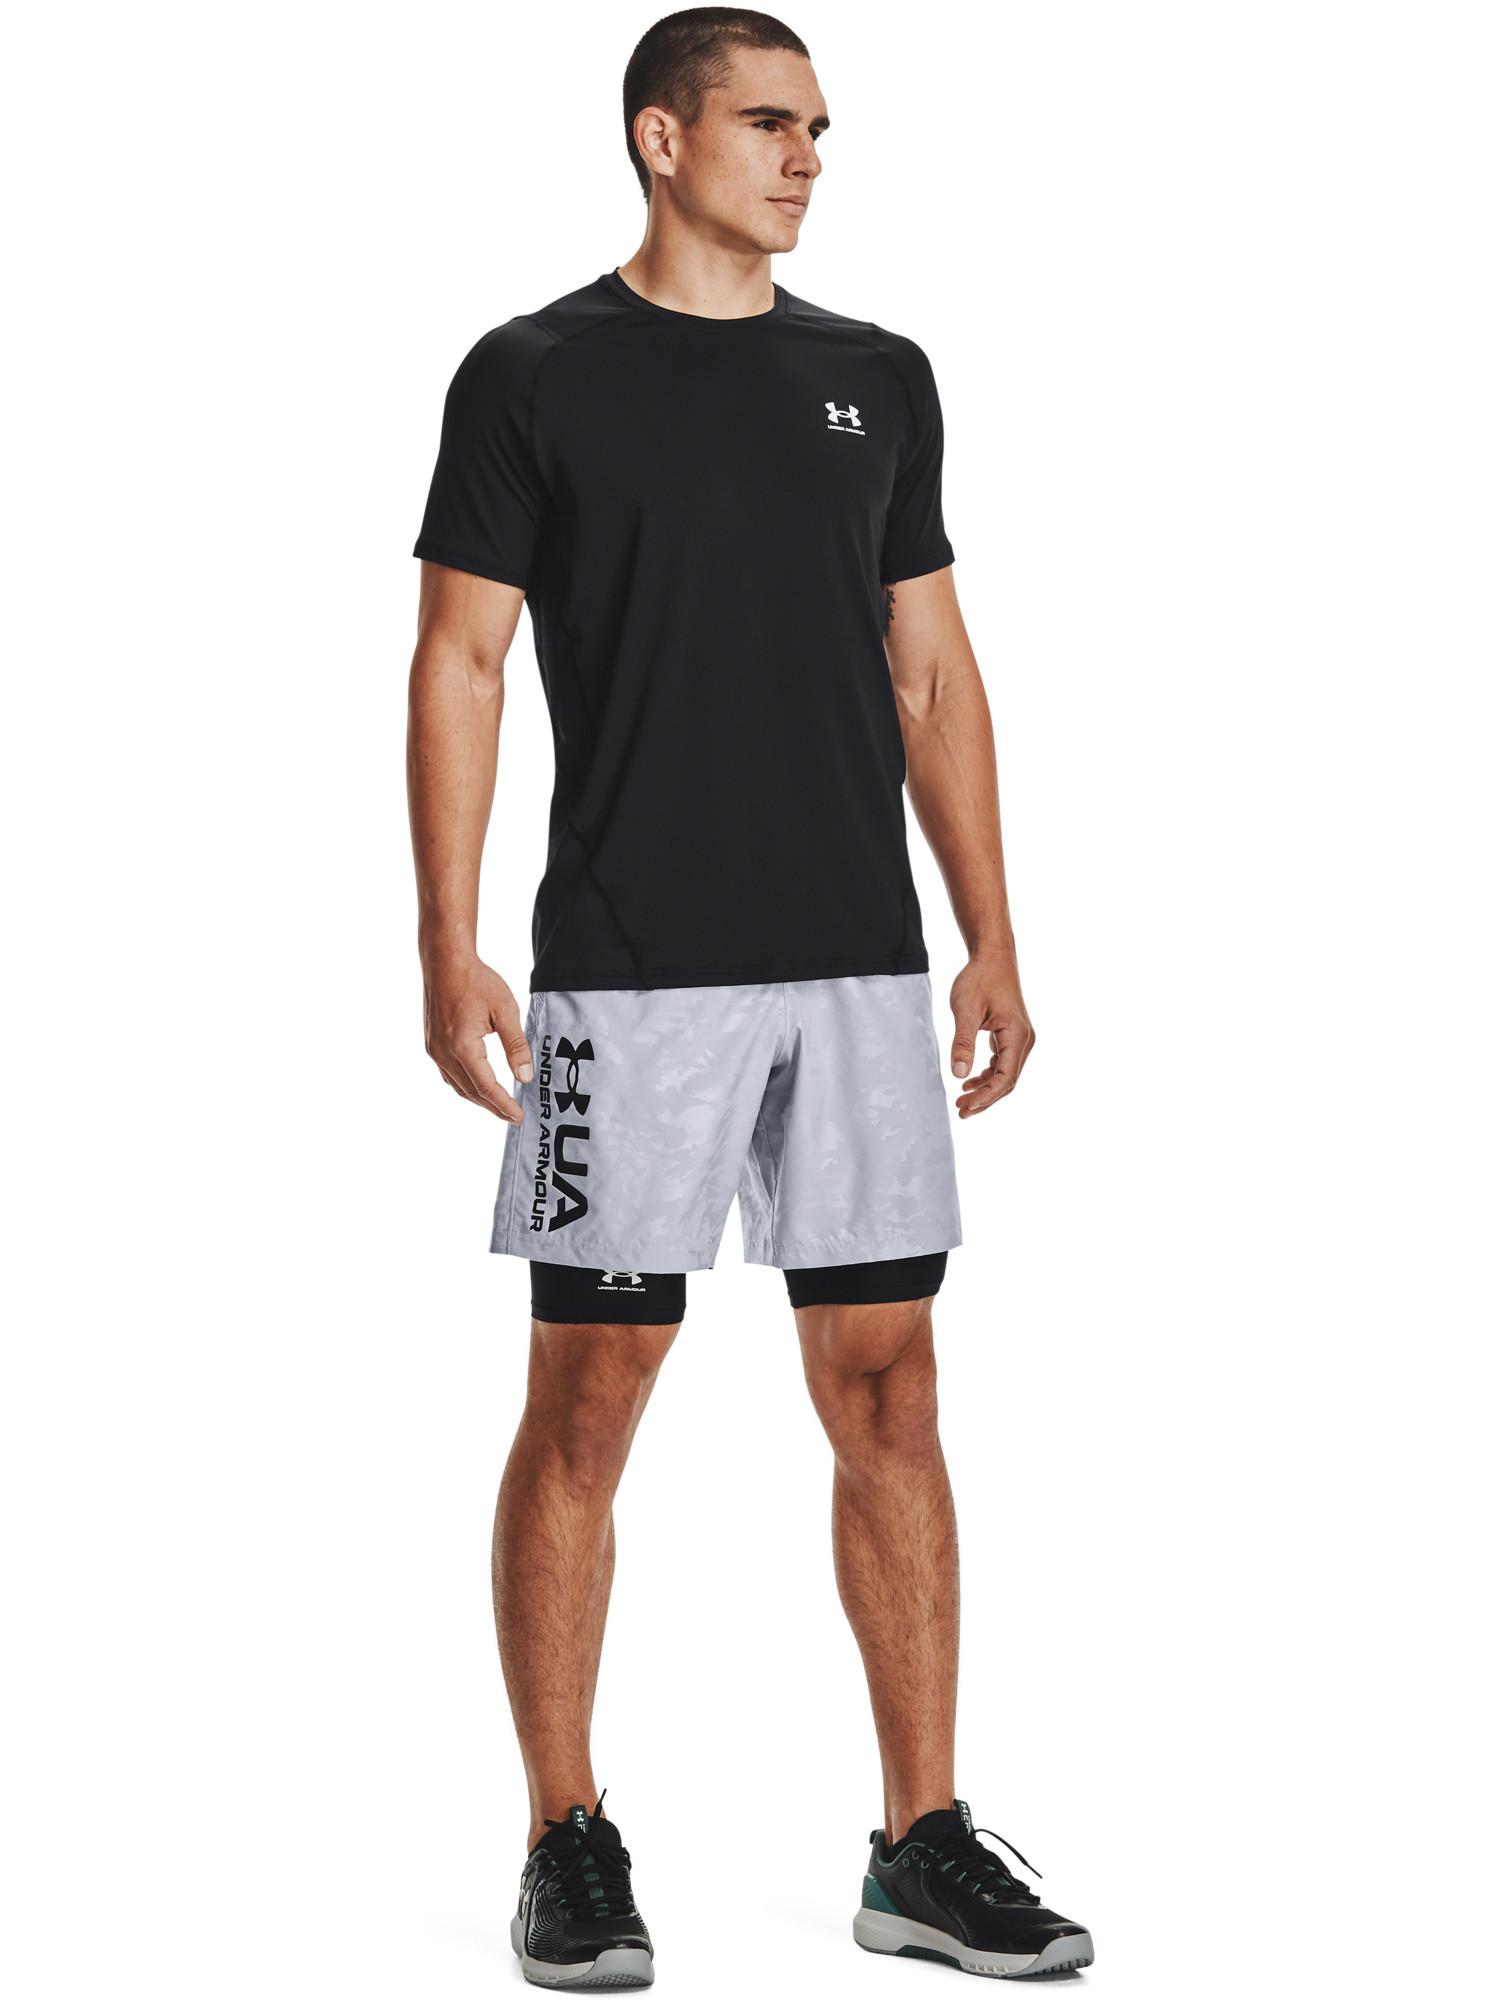 Shorts UA Woven Emboss da uomo, Grigio, large image number 4